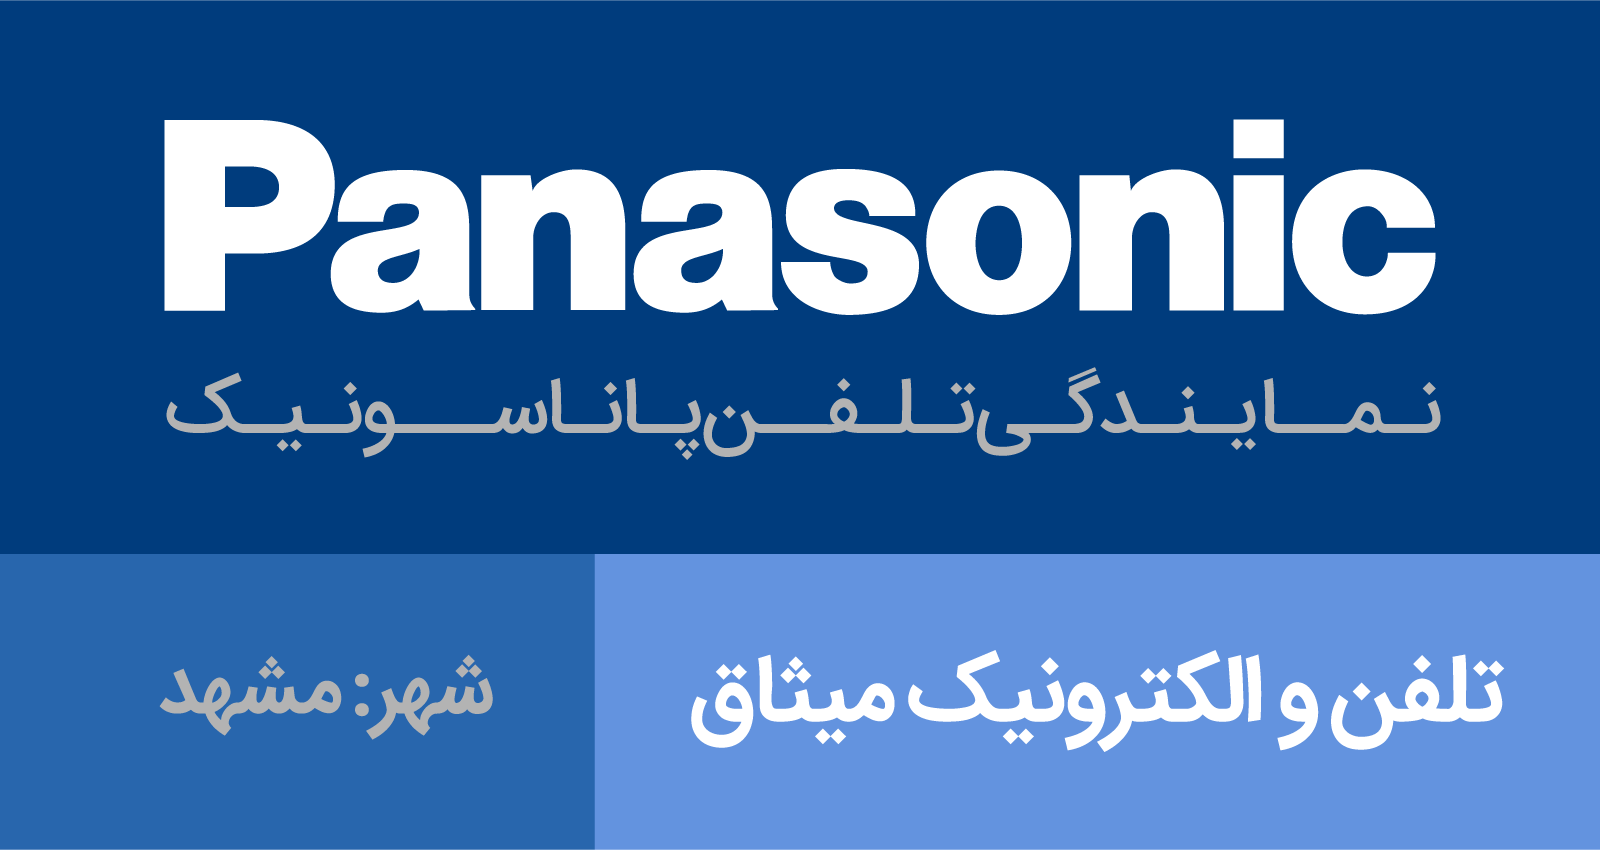 نمایندگی پاناسونیک مشهد - تلفن و الکترونیک میثاق